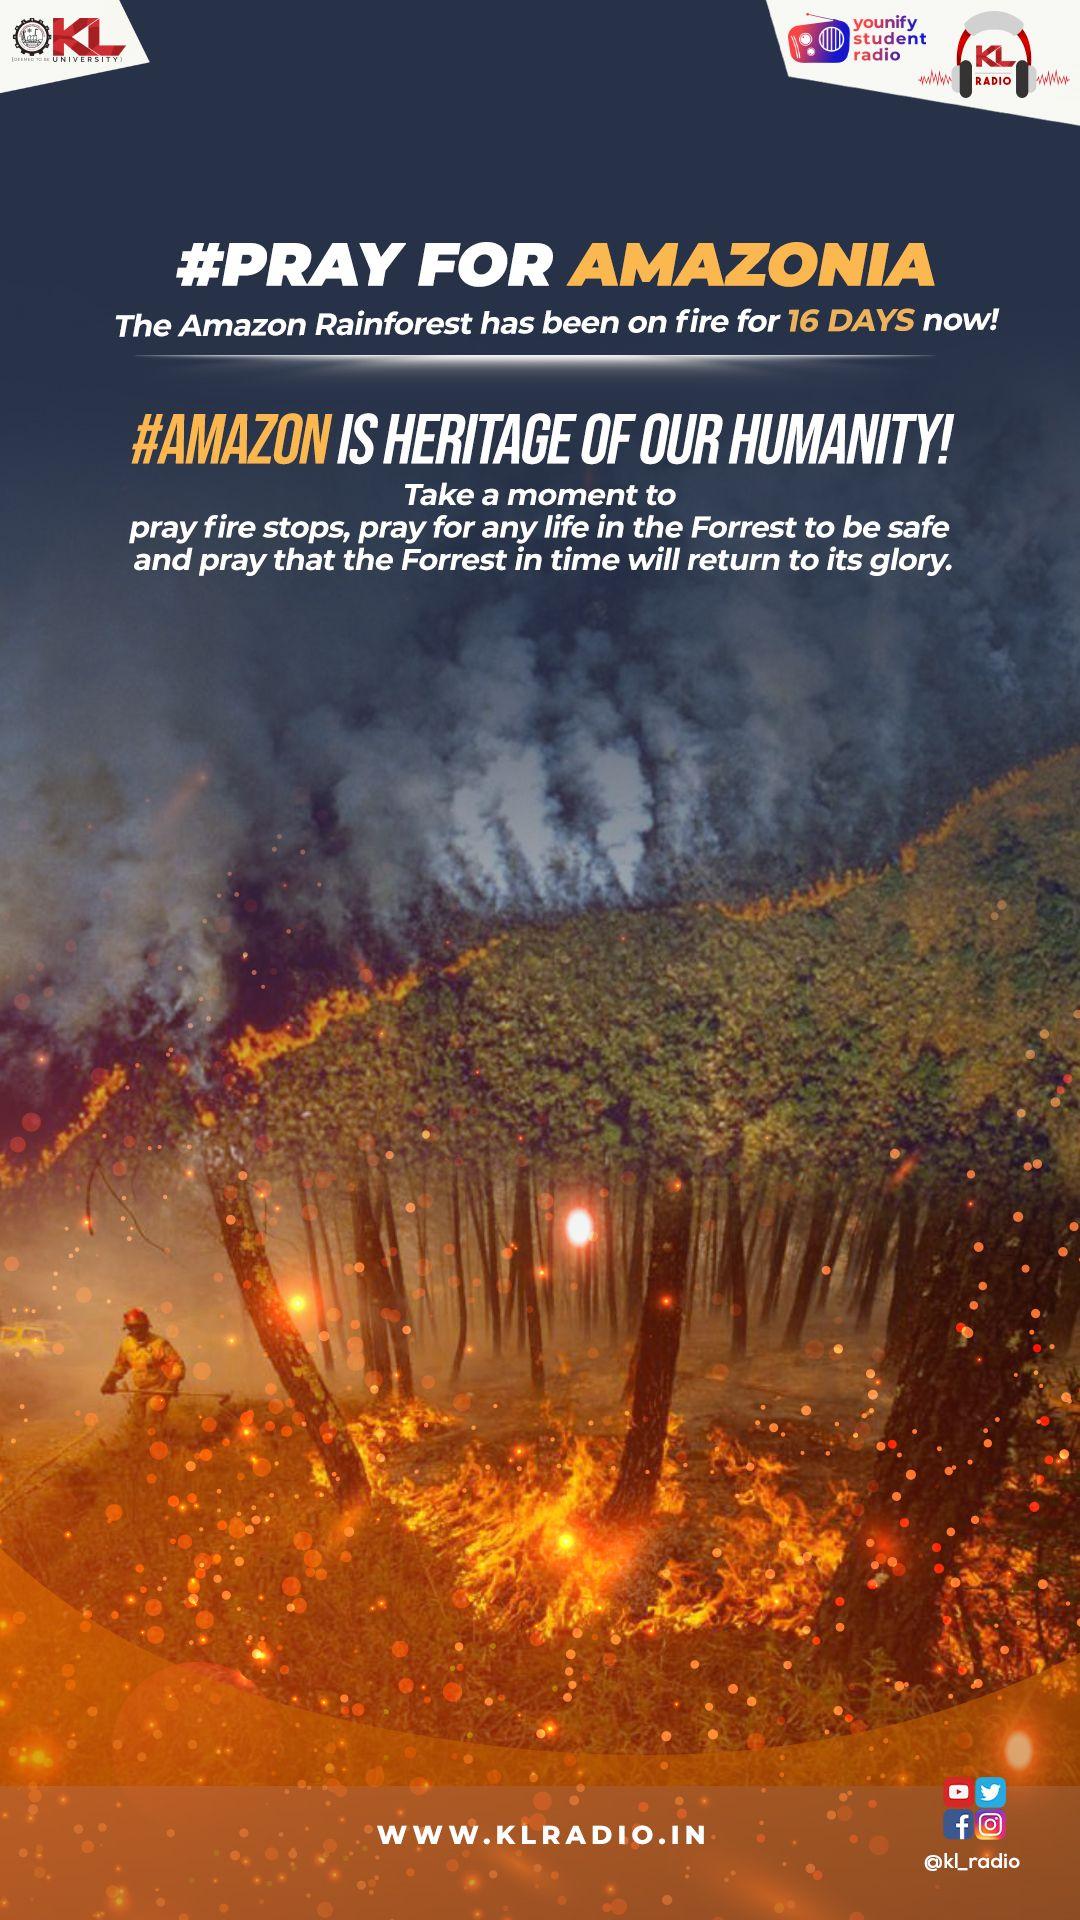 The Amazon Rainforest Is On Fire The Amazon Rainforest Has